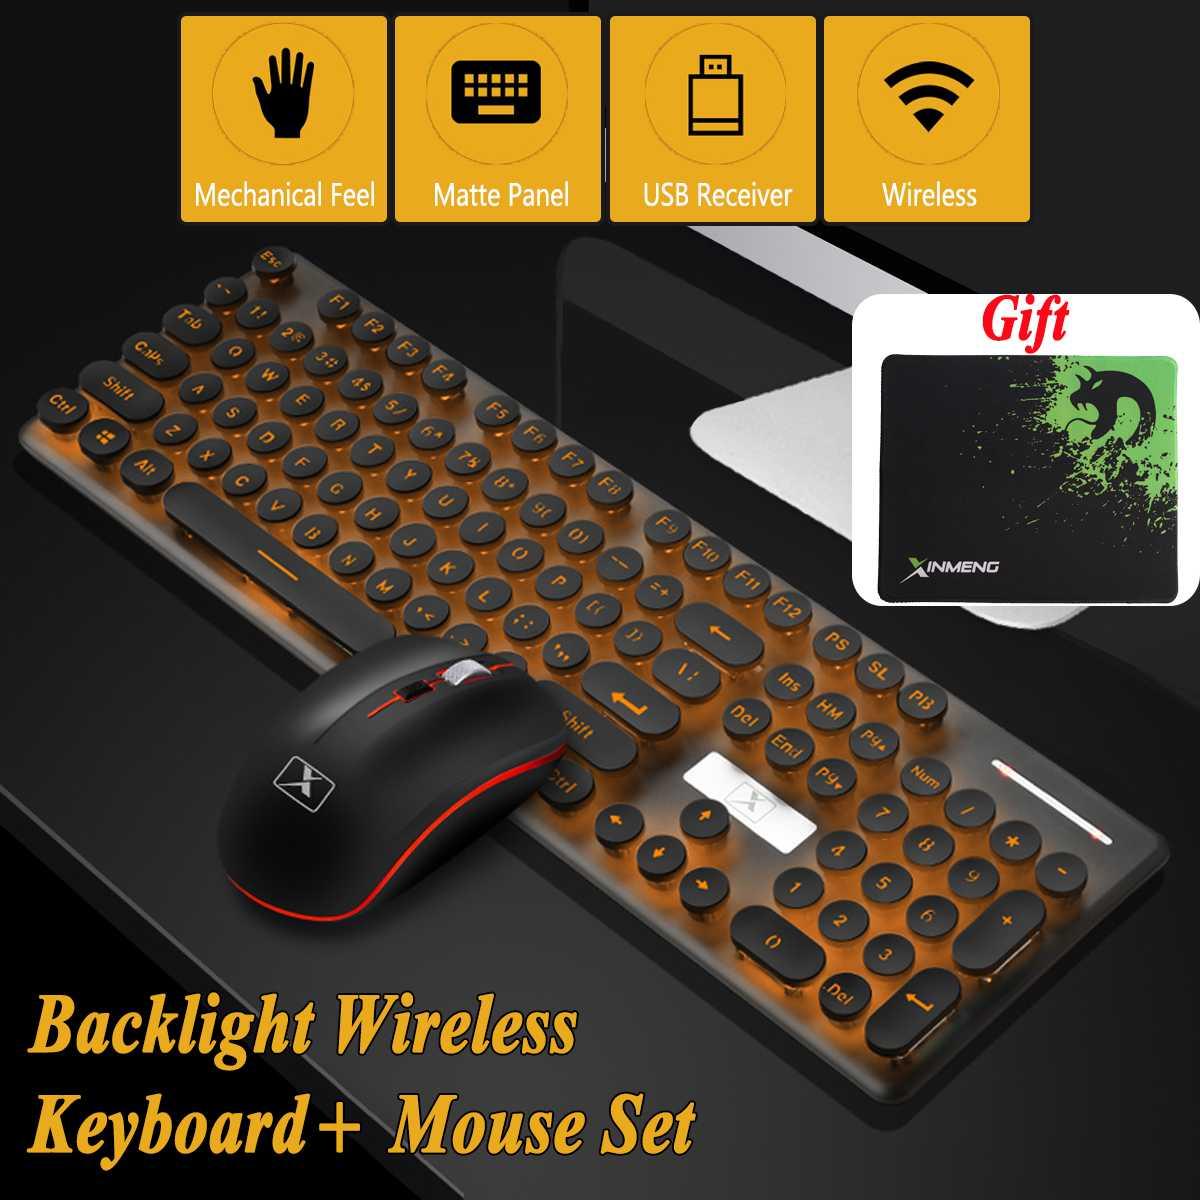 Verbazingwekkend Multimedia 2.4G Wireless Keyboard Mouse Combos Rechargeable Mute MB-28